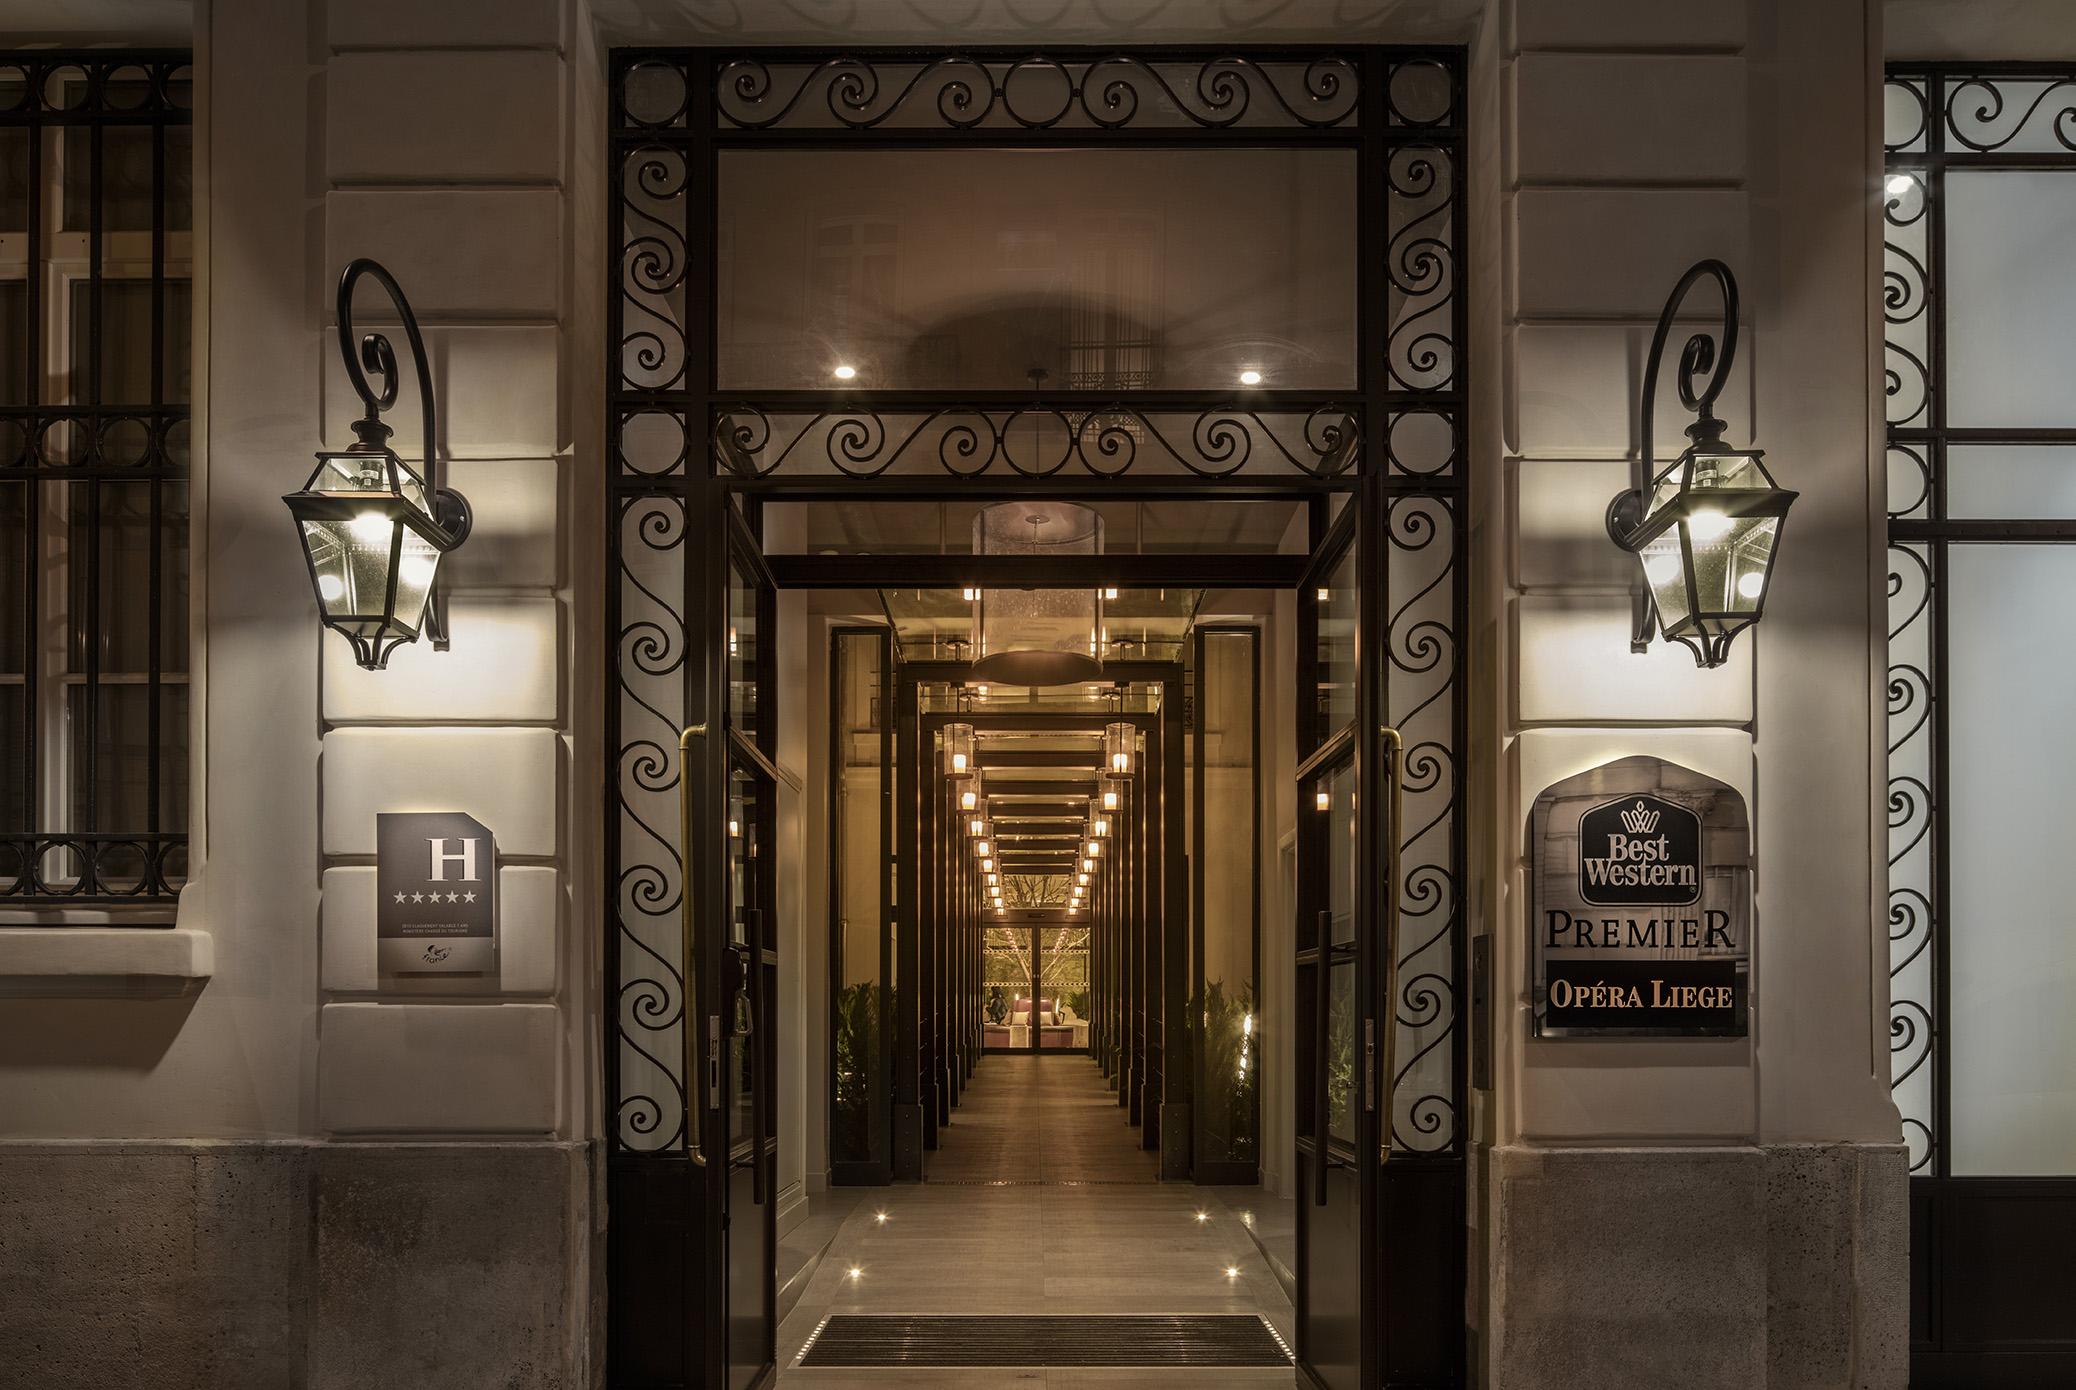 H tel opera liege 75 paris cim for Hotel paris 75